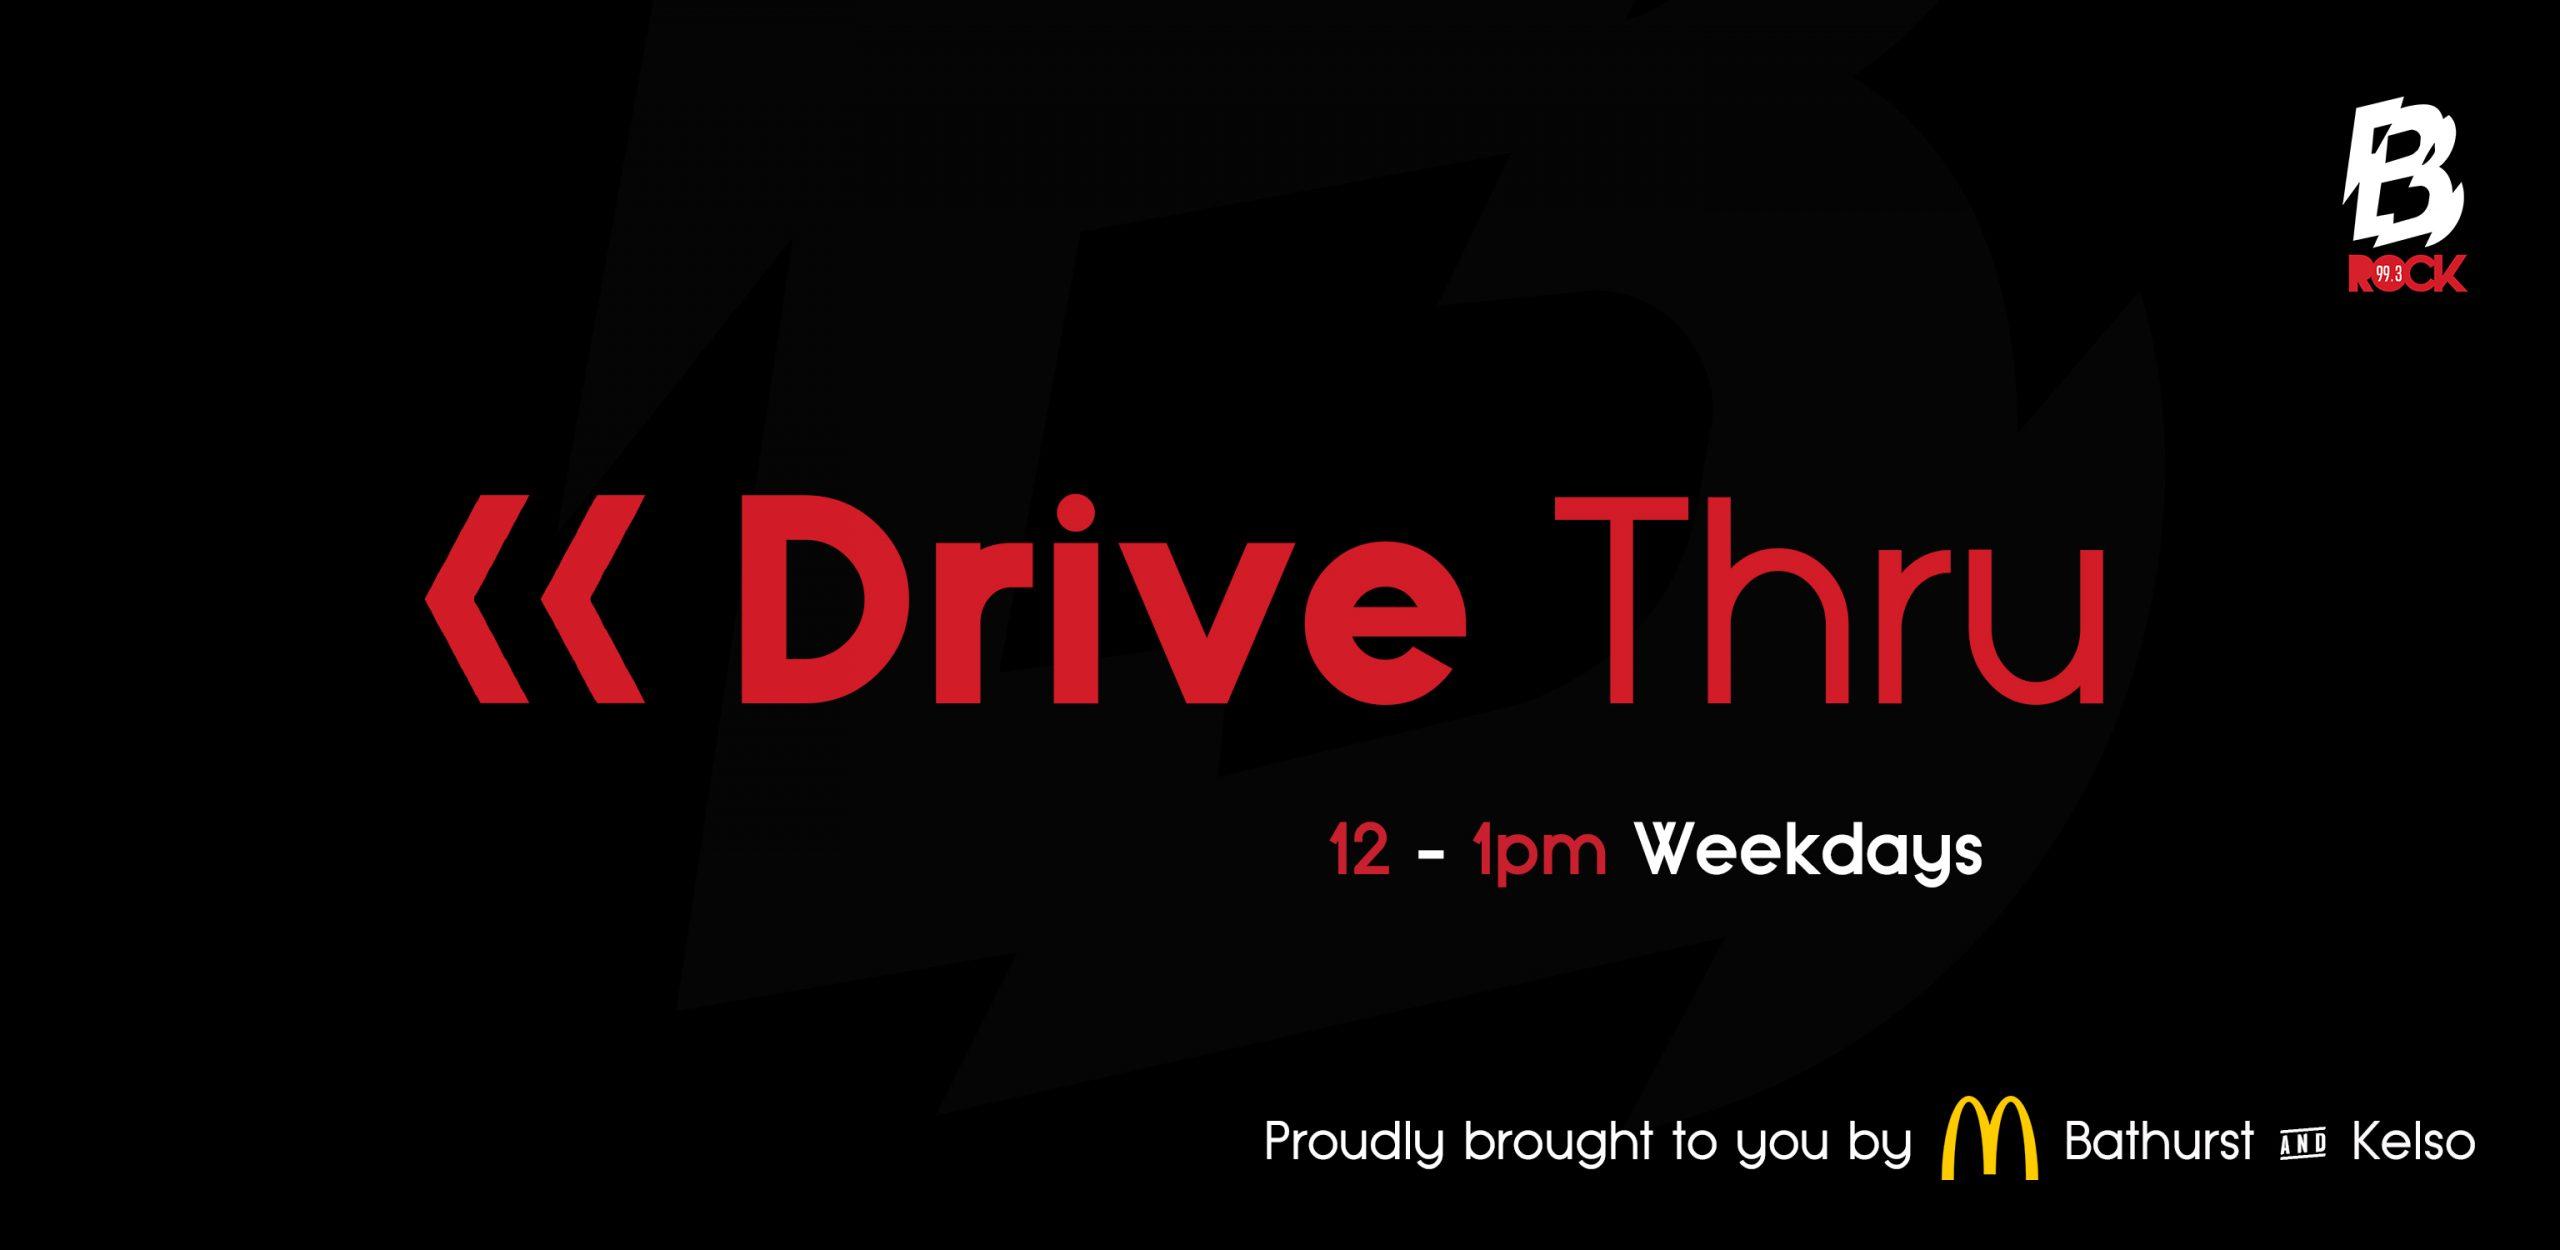 Feature: http://www.brockfm.com.au/the-drive-thru/